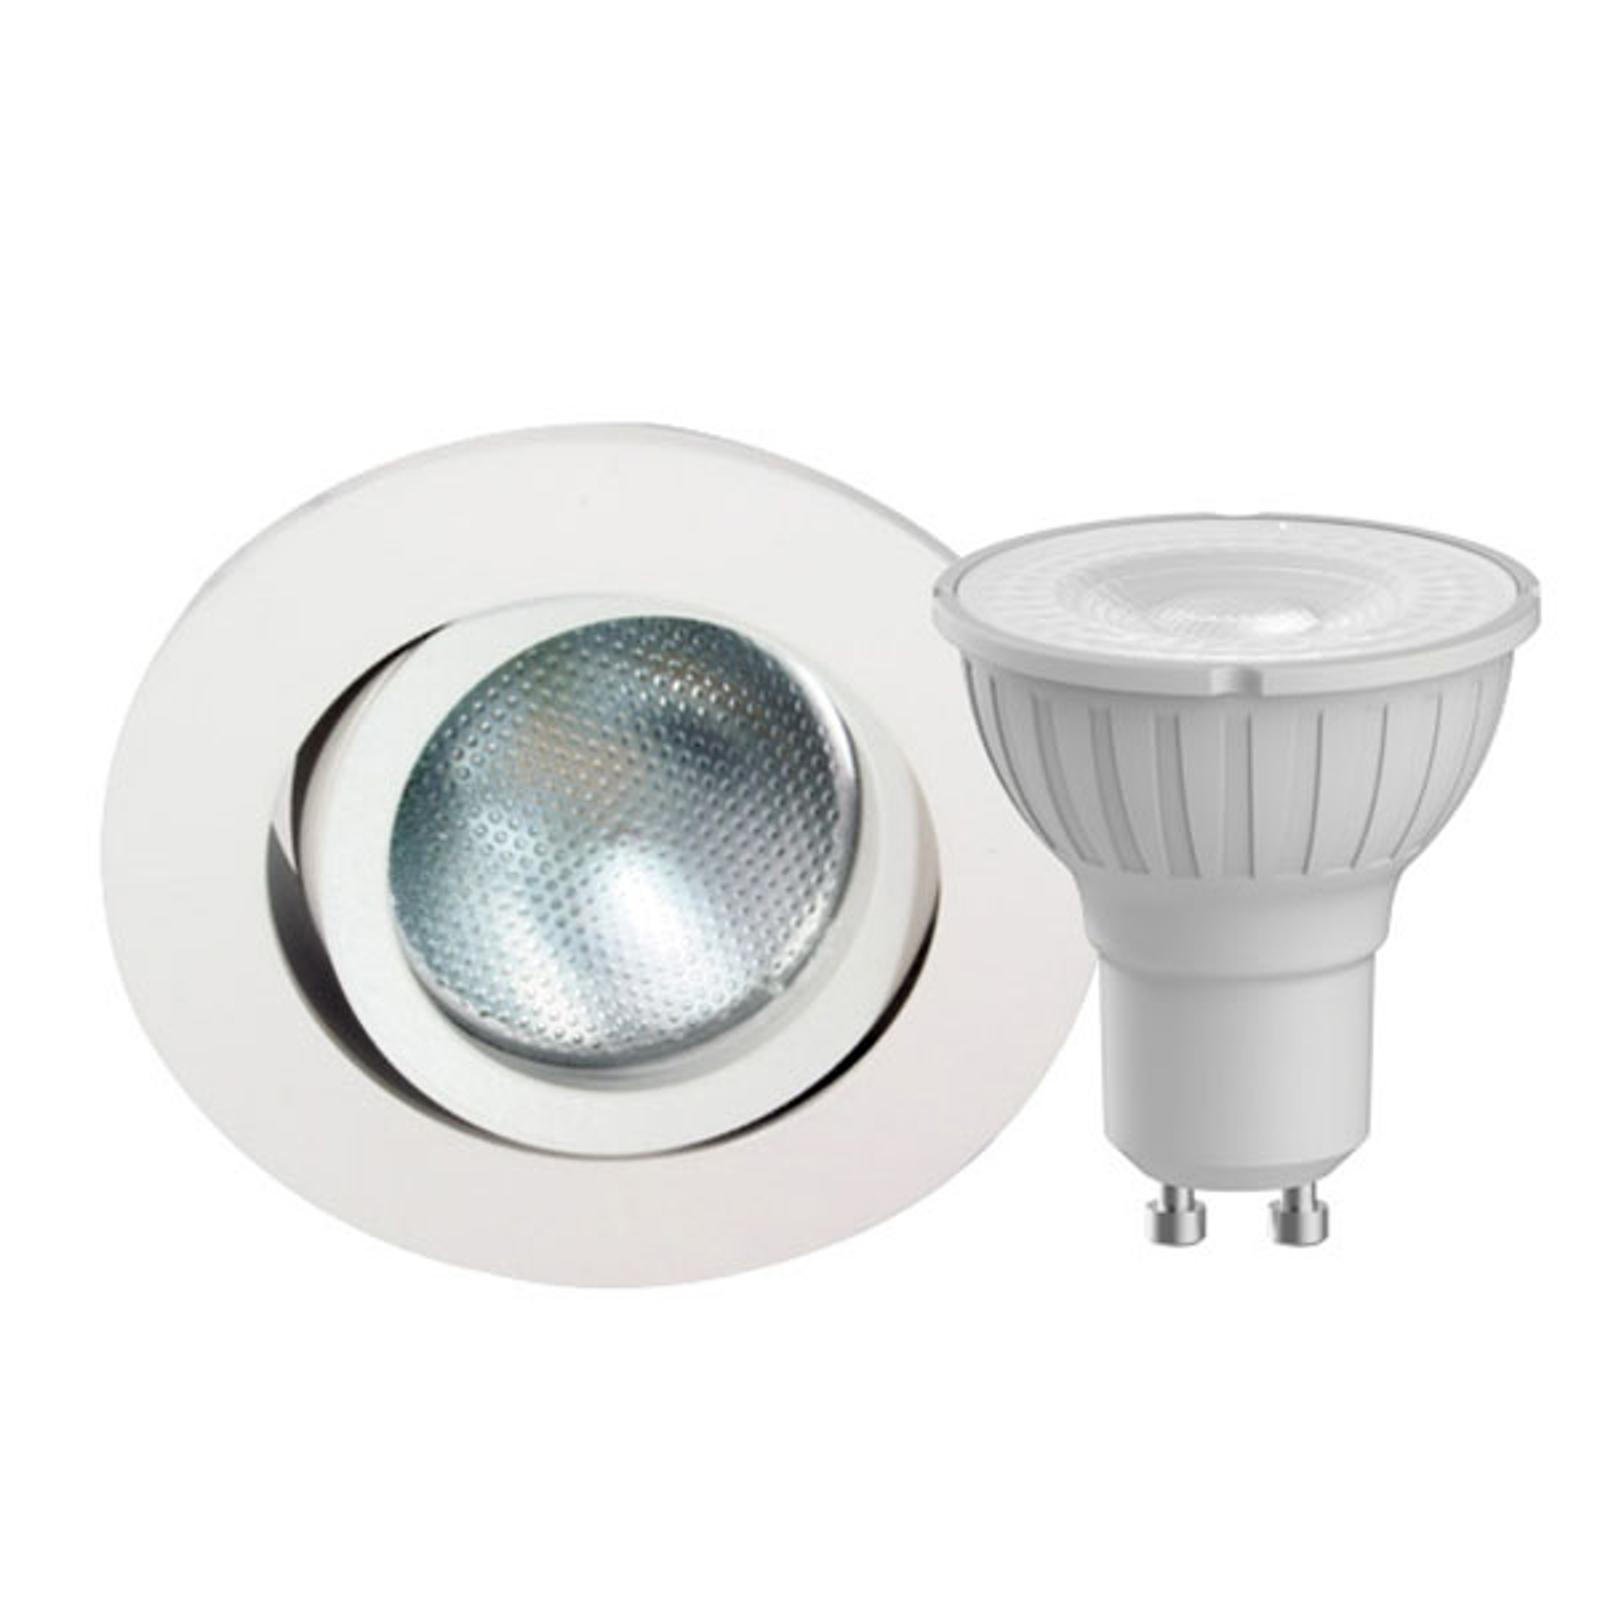 Megaman DecoclicSet LED-indbyg.spot GU10 5W hvid